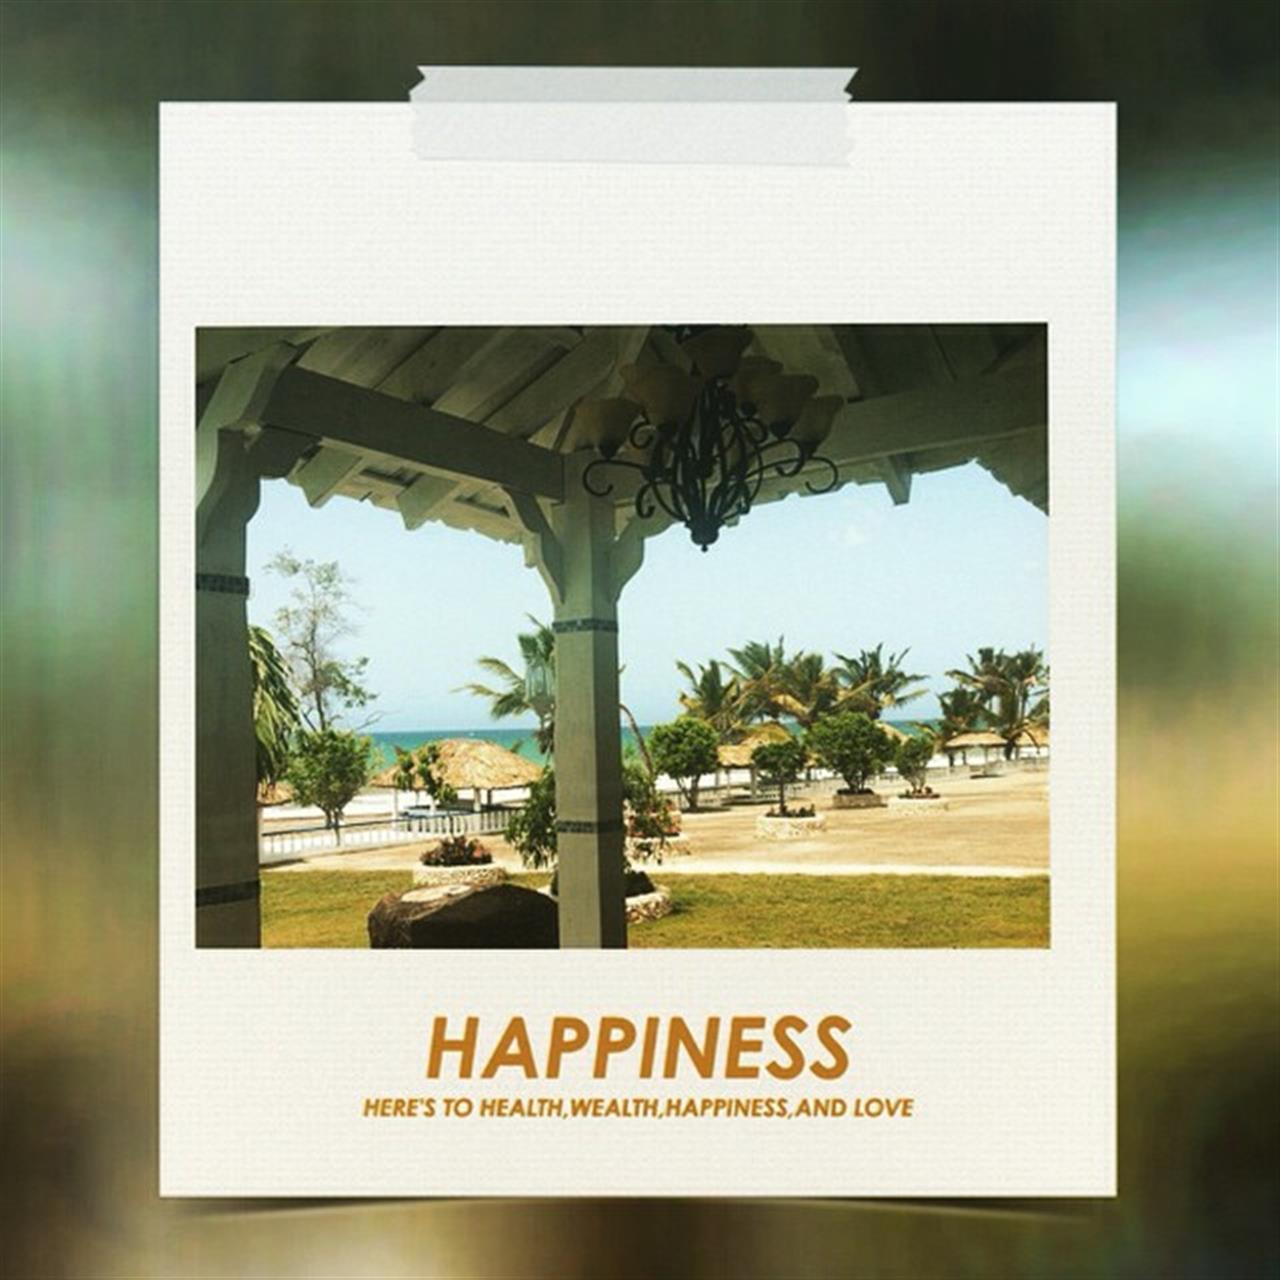 #Northcoast of the #DominicanRepublic #leadingrelocal #sky #sun #summer #beach #beautiful #pretty #sunset #sunrise #blue #flowers #night #tree #twilight #clouds #beauty #light #photooftheday #love #green #skylovers #dusk #weather #day #mothernature www.selectcaribbean.com #photogrid @photogridorg